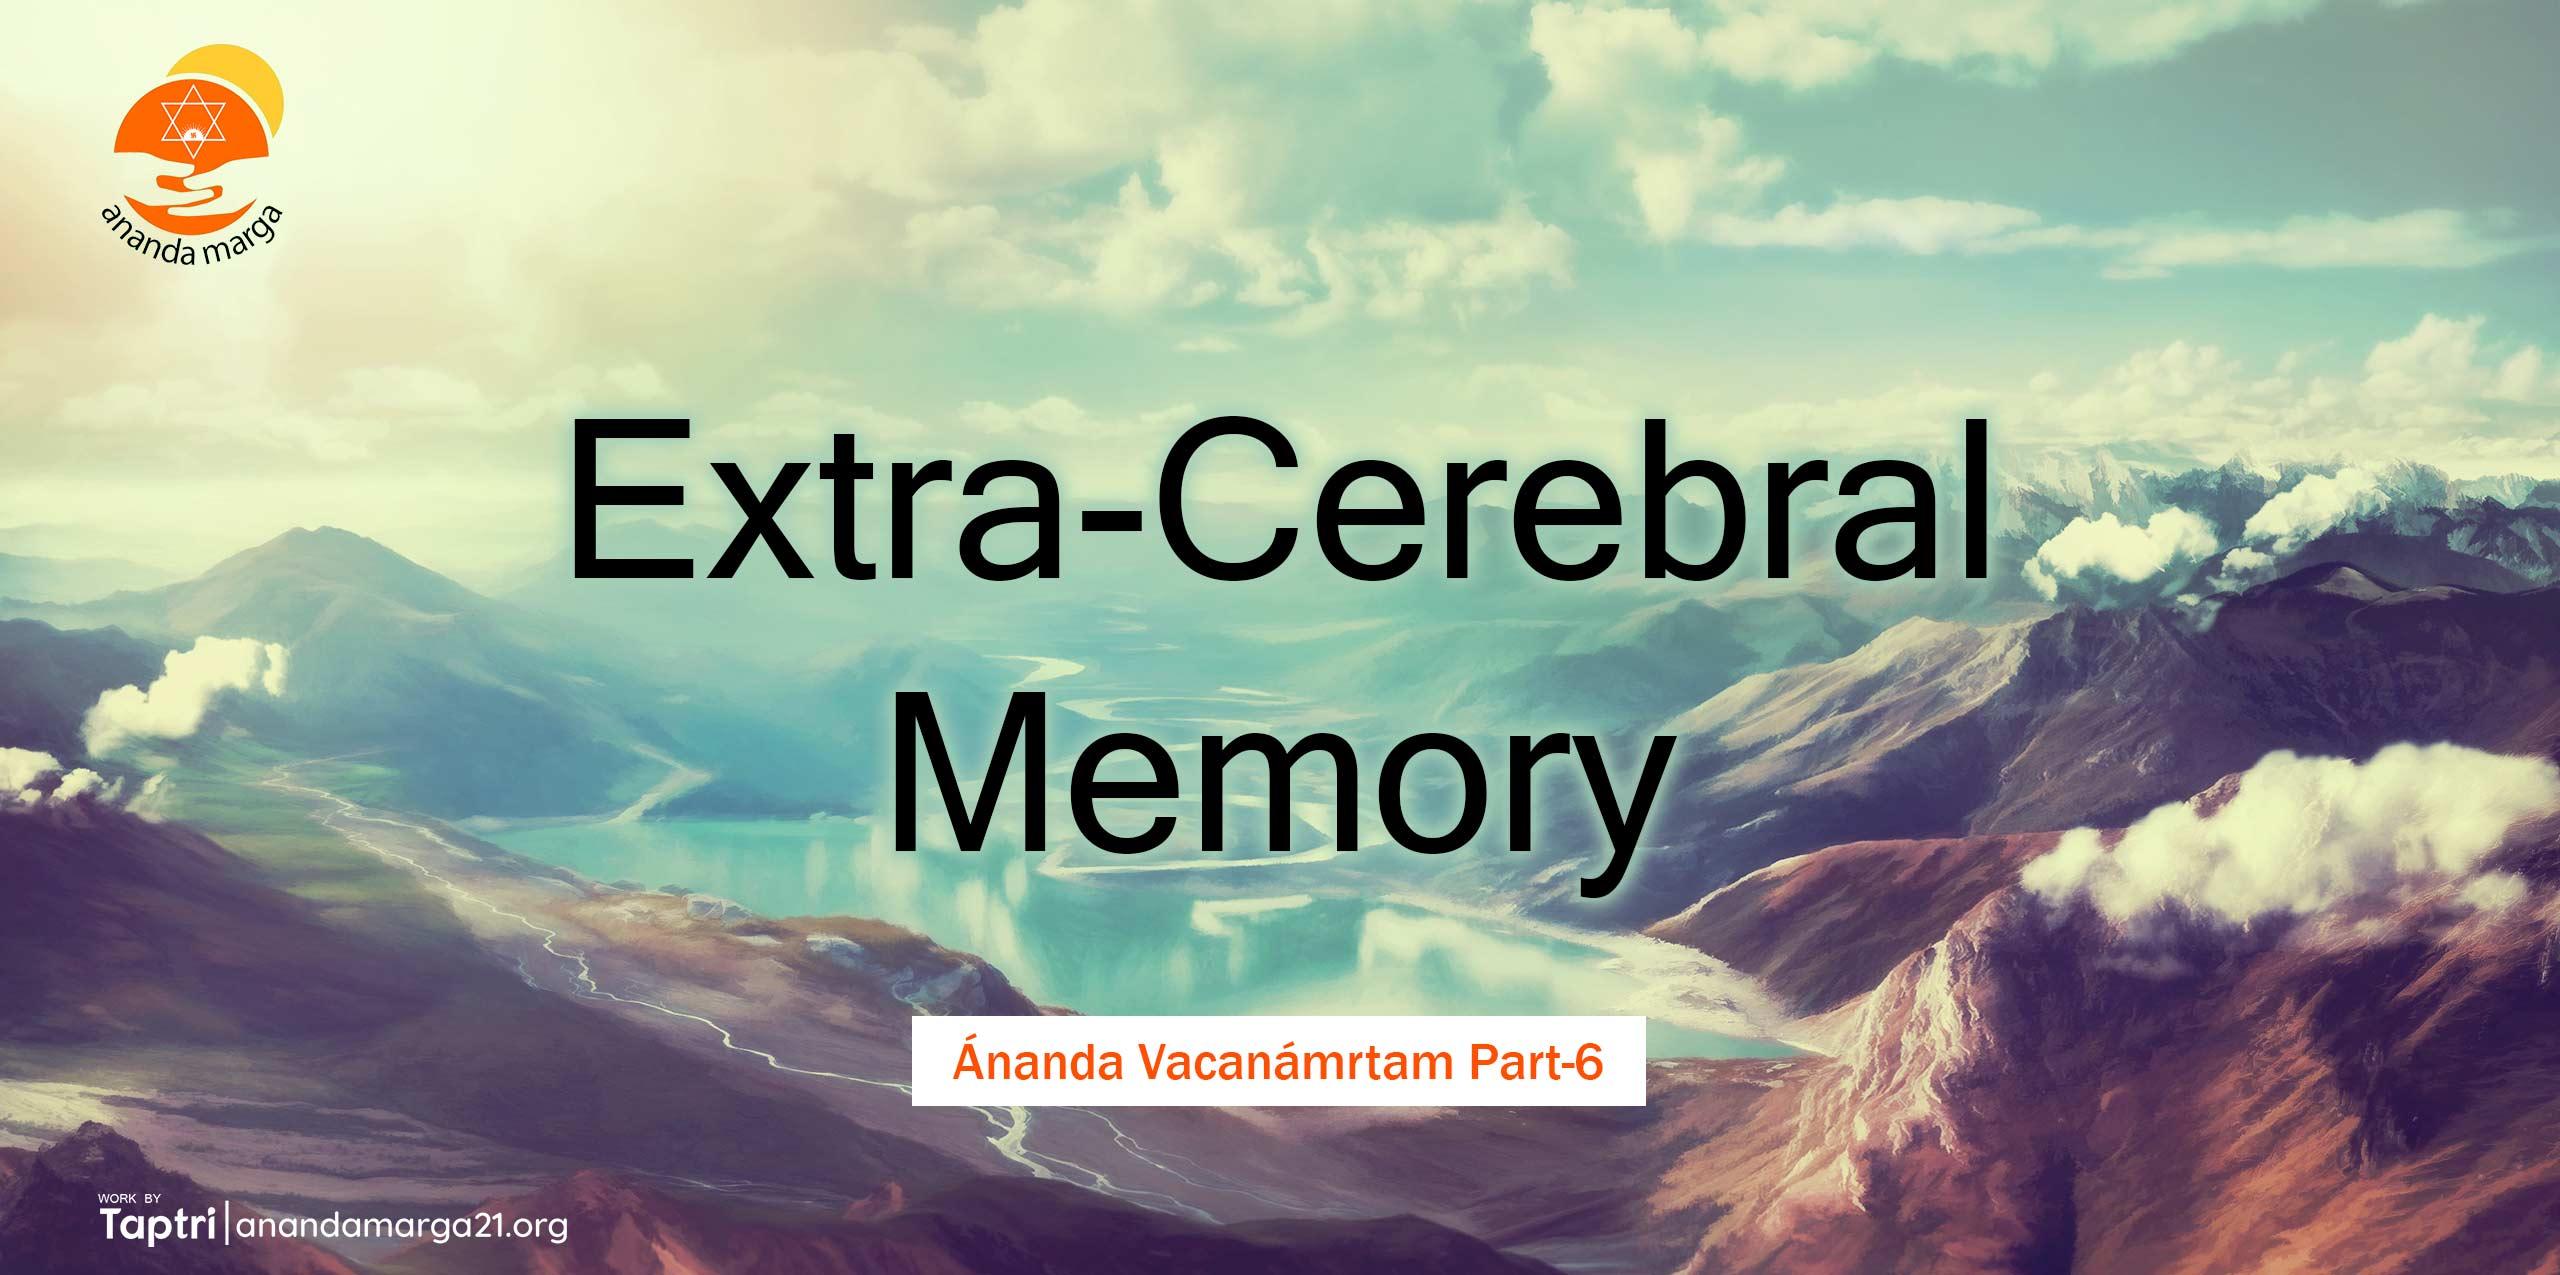 Extra-Cerebral-Memory-Ananda-Vacanamrtm-06-anandamarga